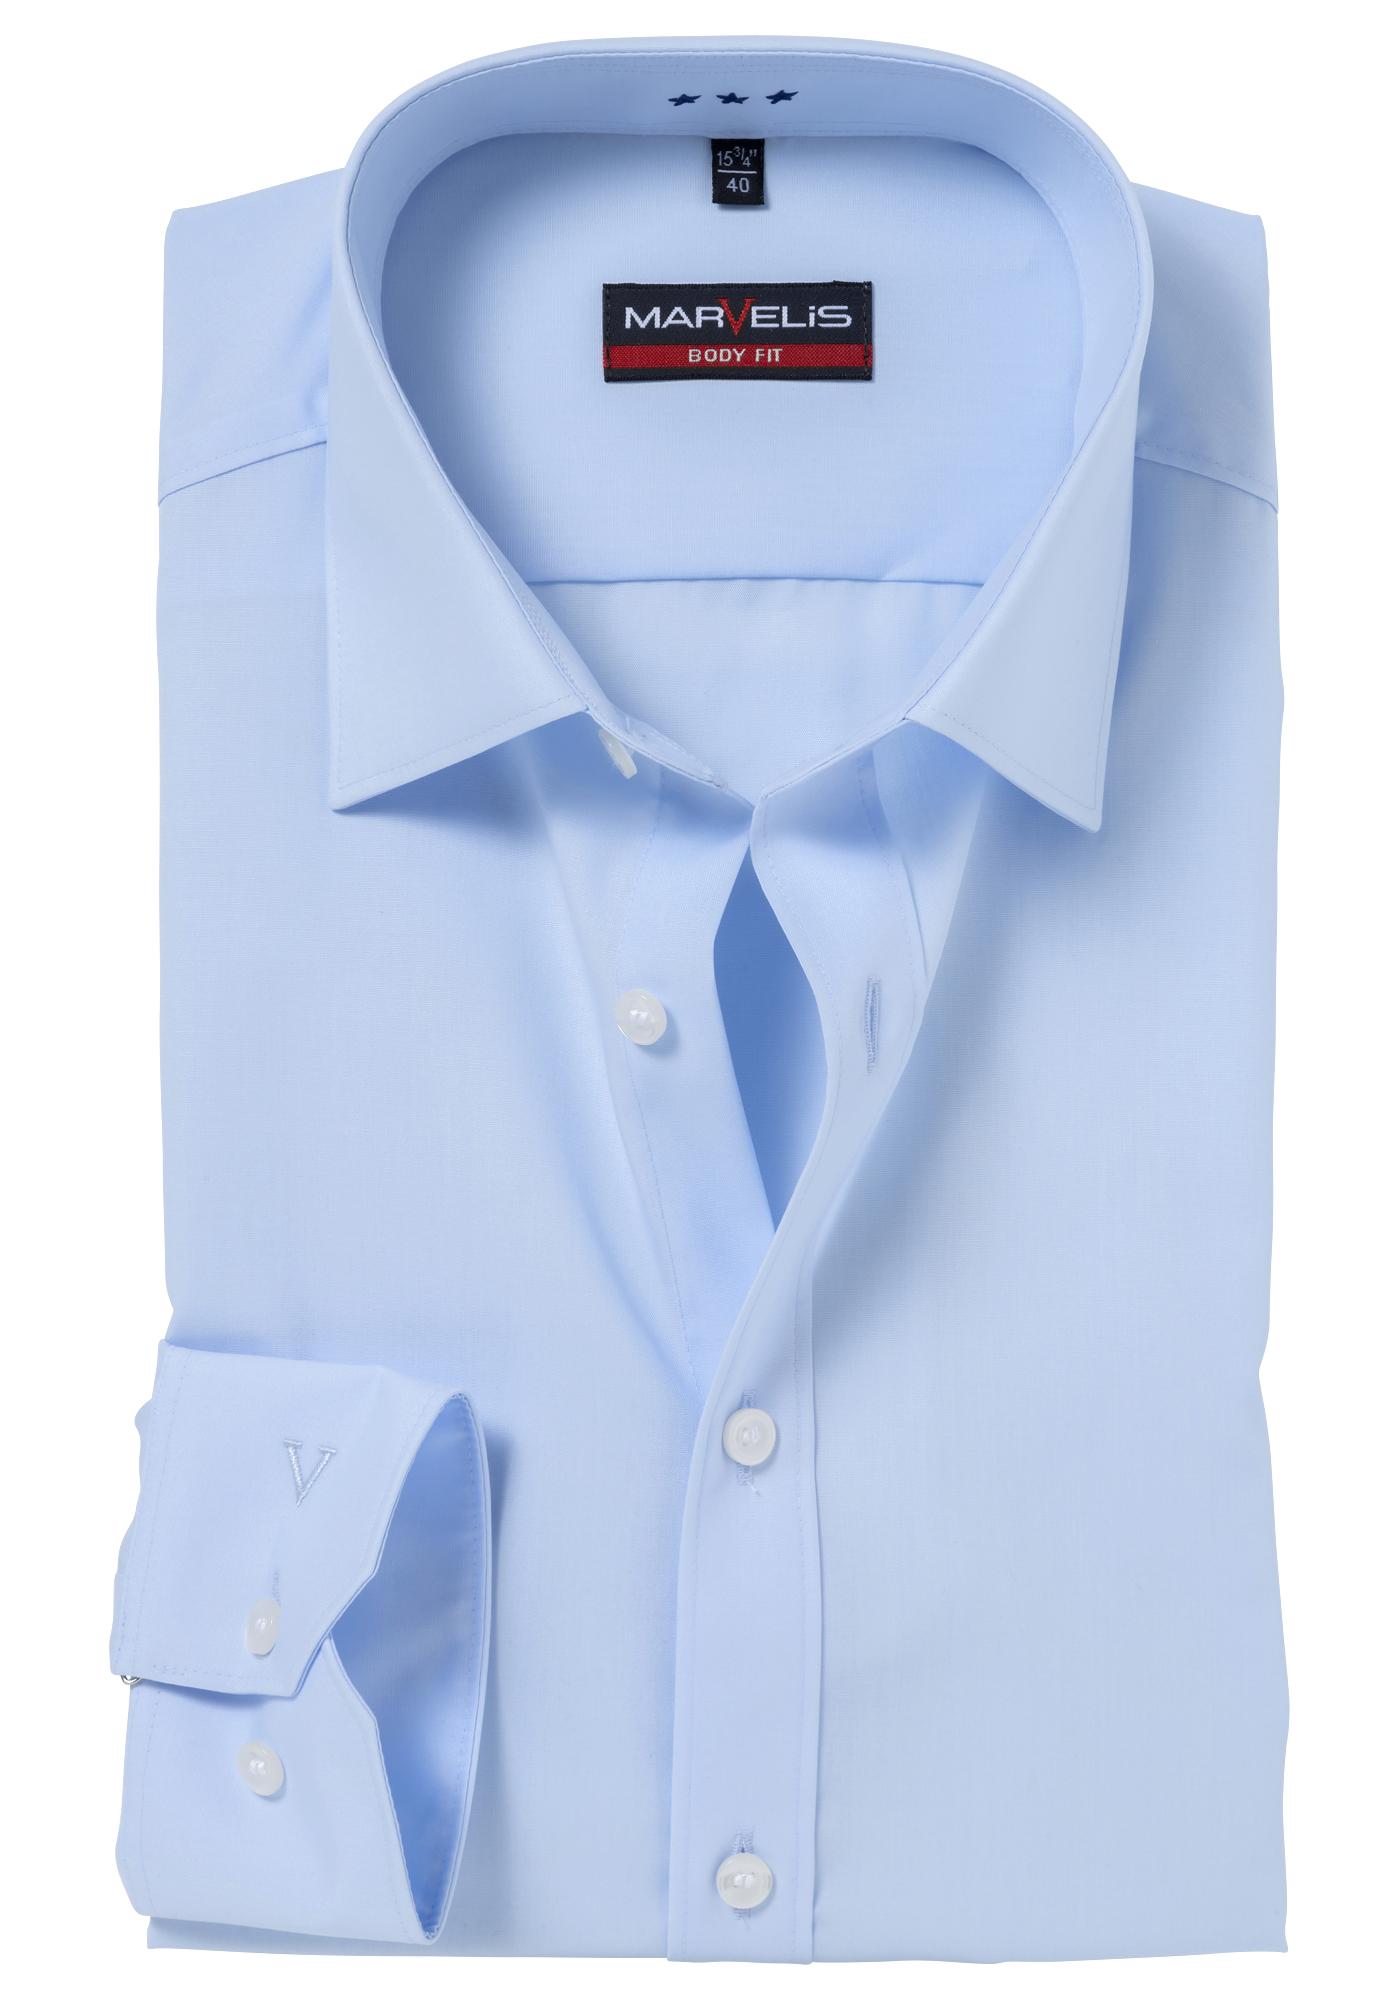 marvelis body fit overhemd mouwlengte 7 lichtblauw gratis verzending. Black Bedroom Furniture Sets. Home Design Ideas